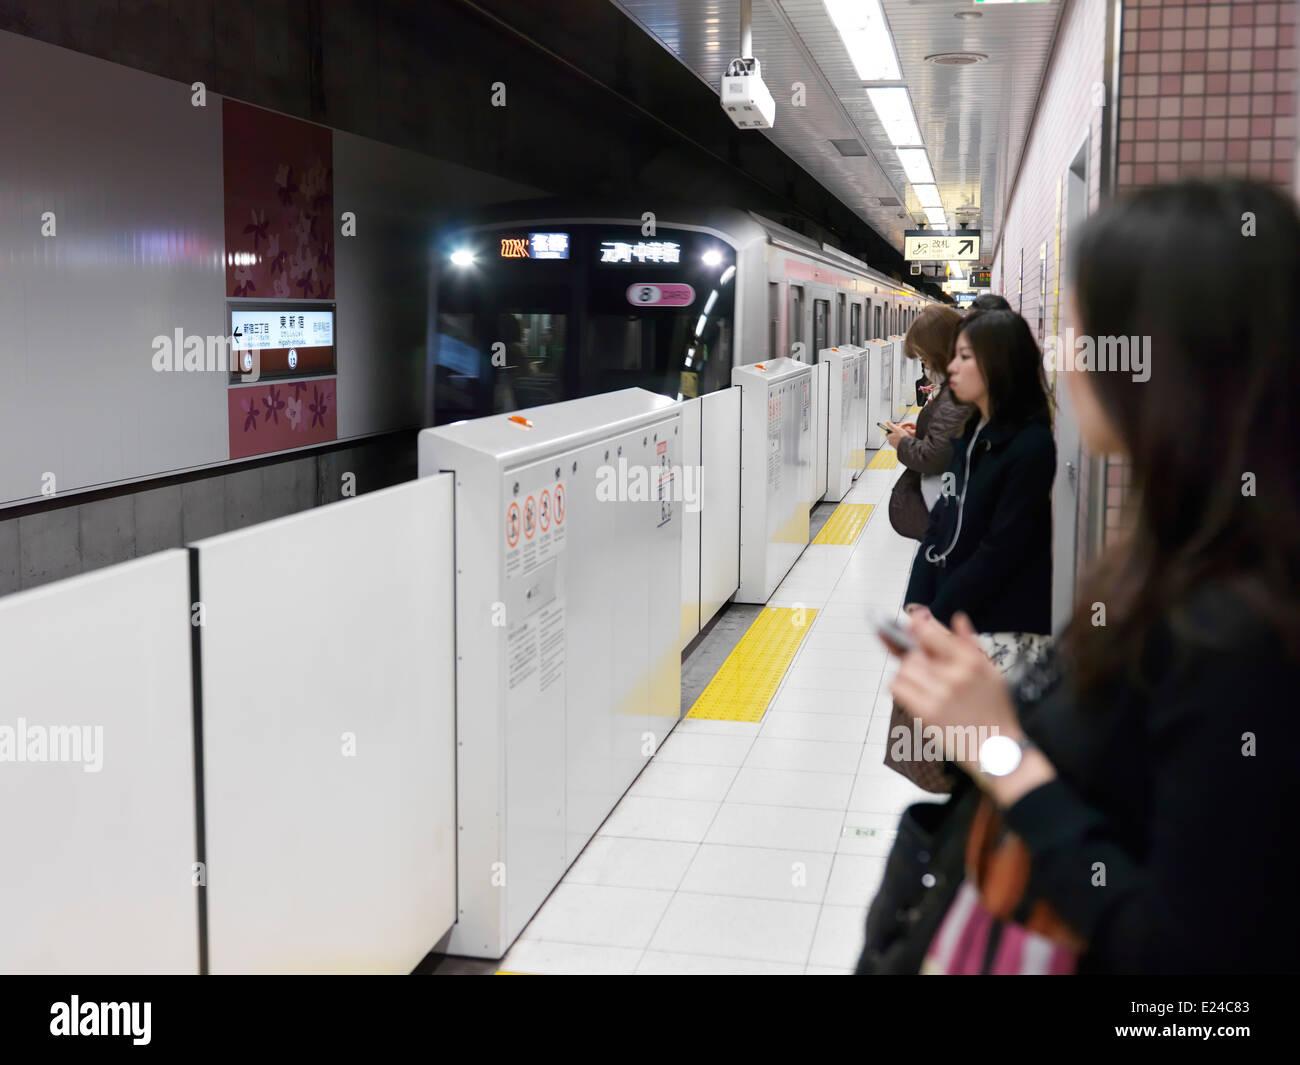 Tokyo Metro subway train arriving to a platform in Tokyo, Japan. - Stock Image